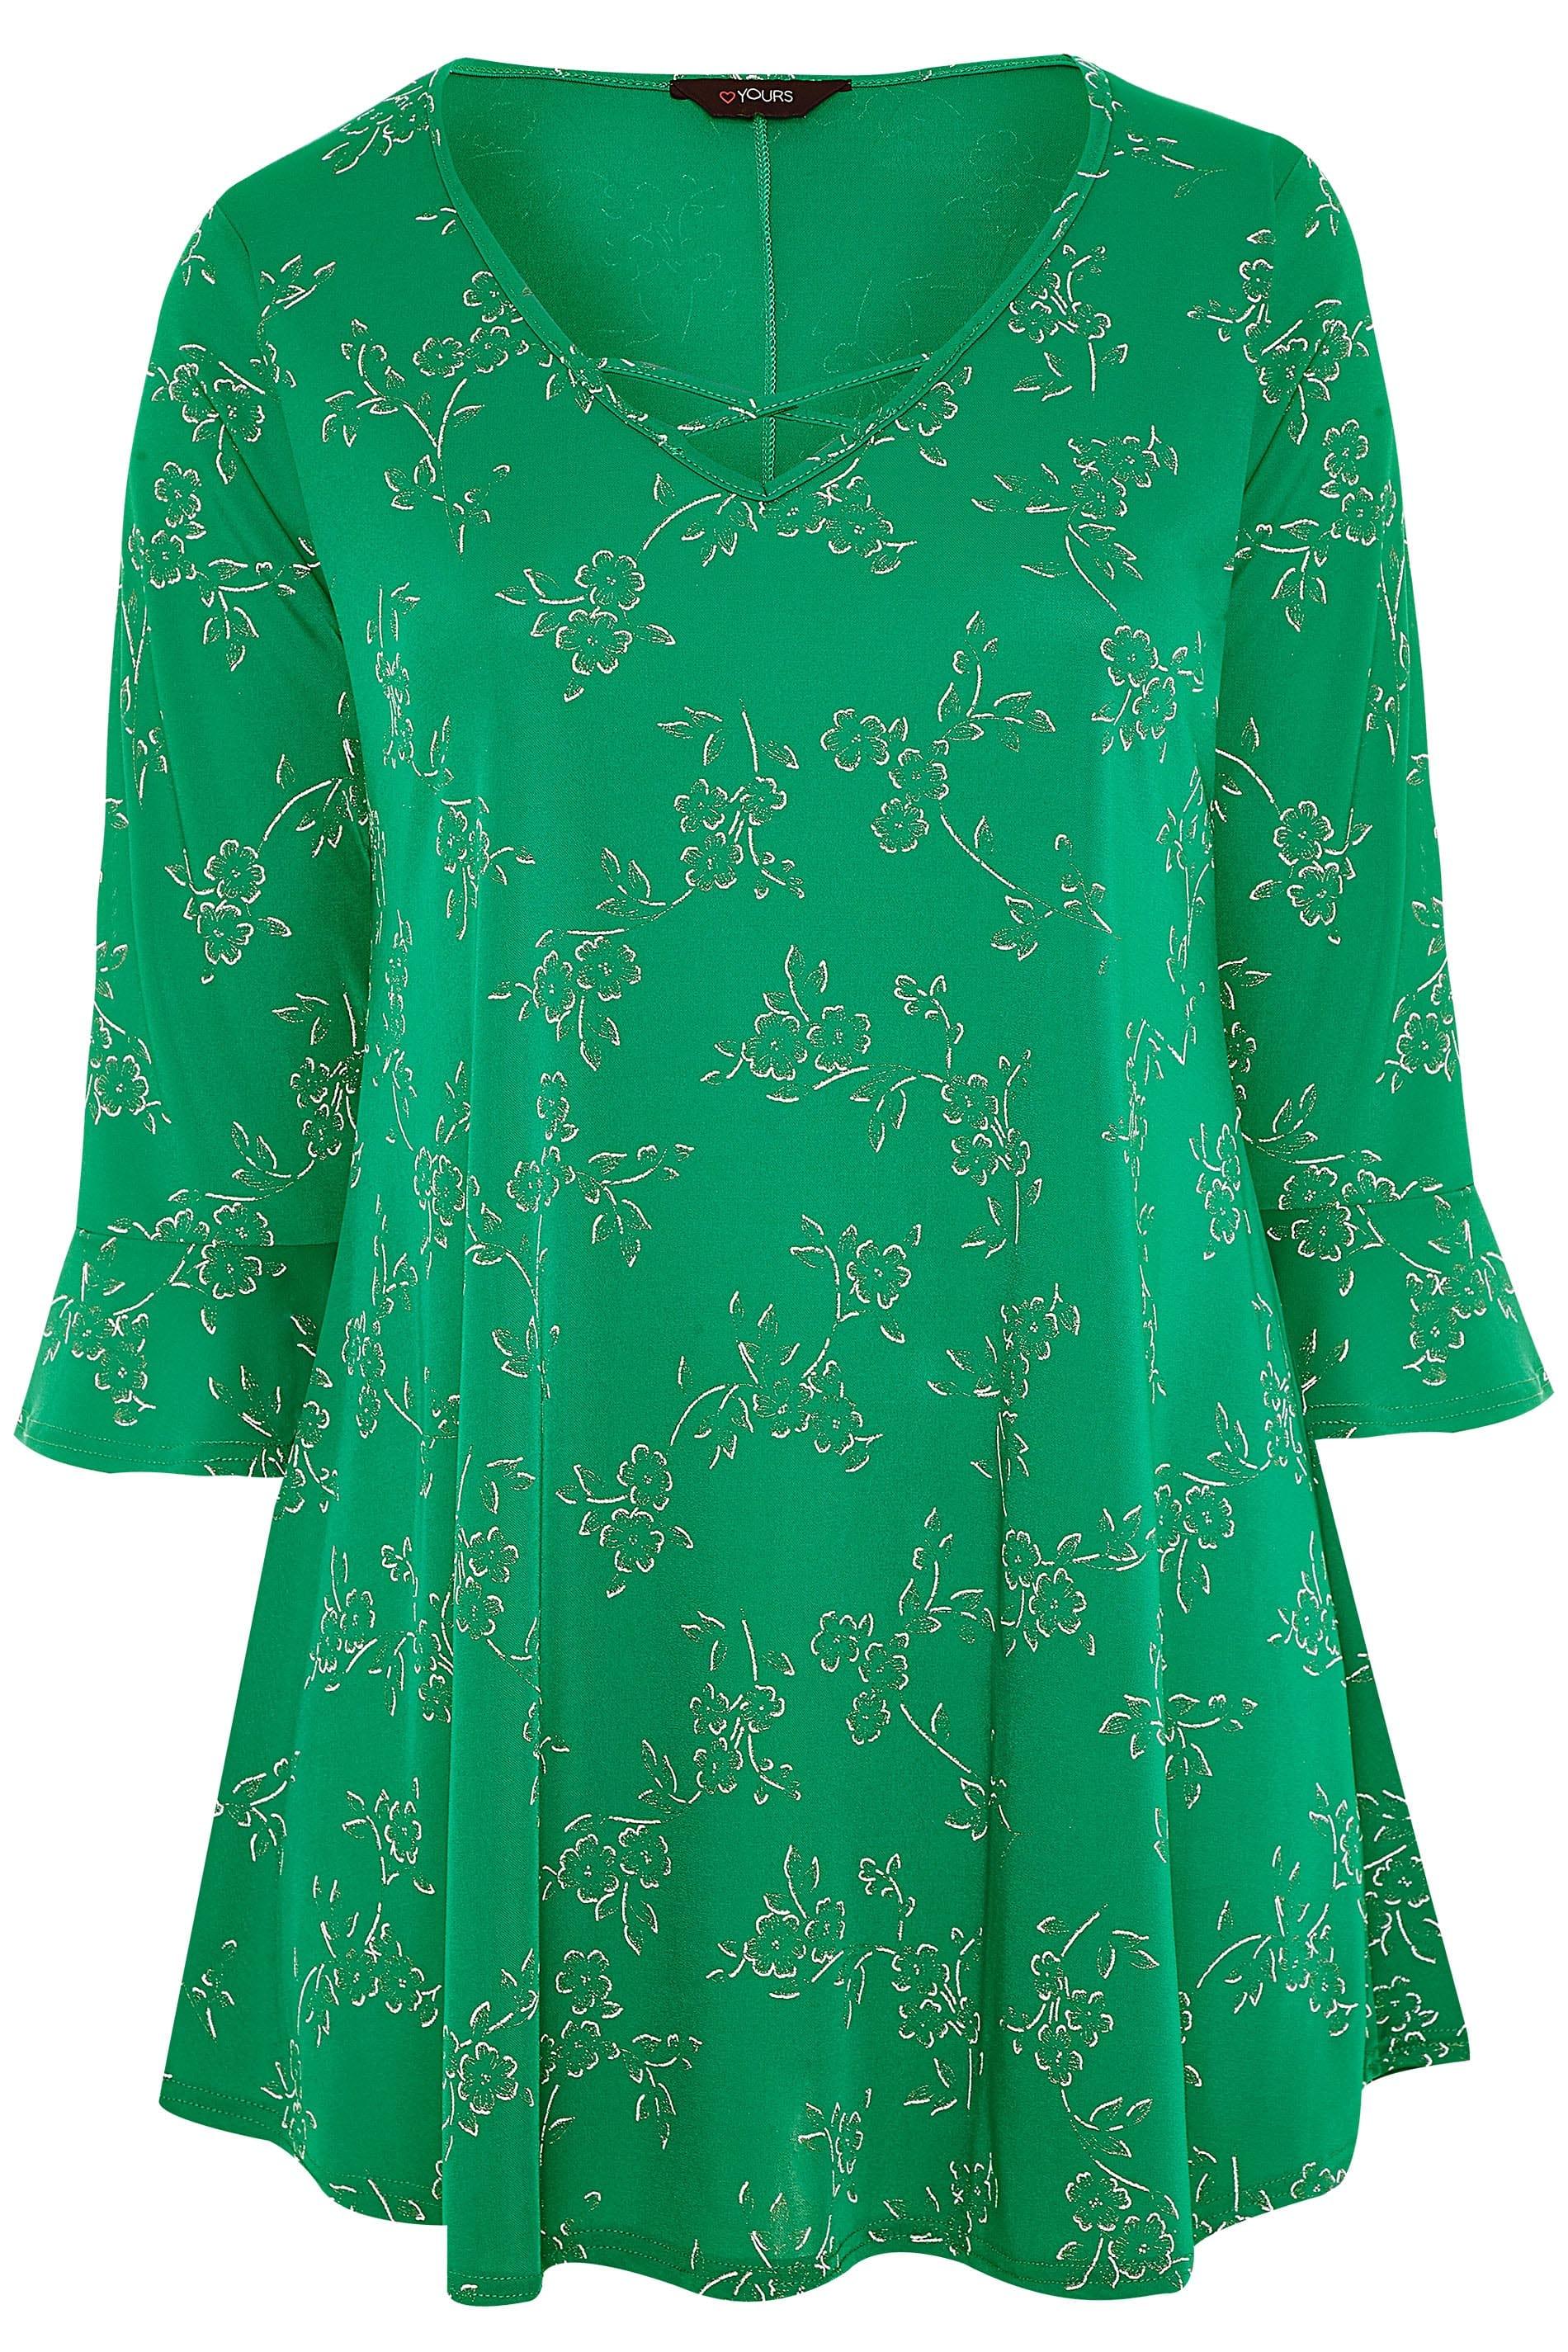 Yours Clothing Damen Übergröße Blumenmuster Gitter Top